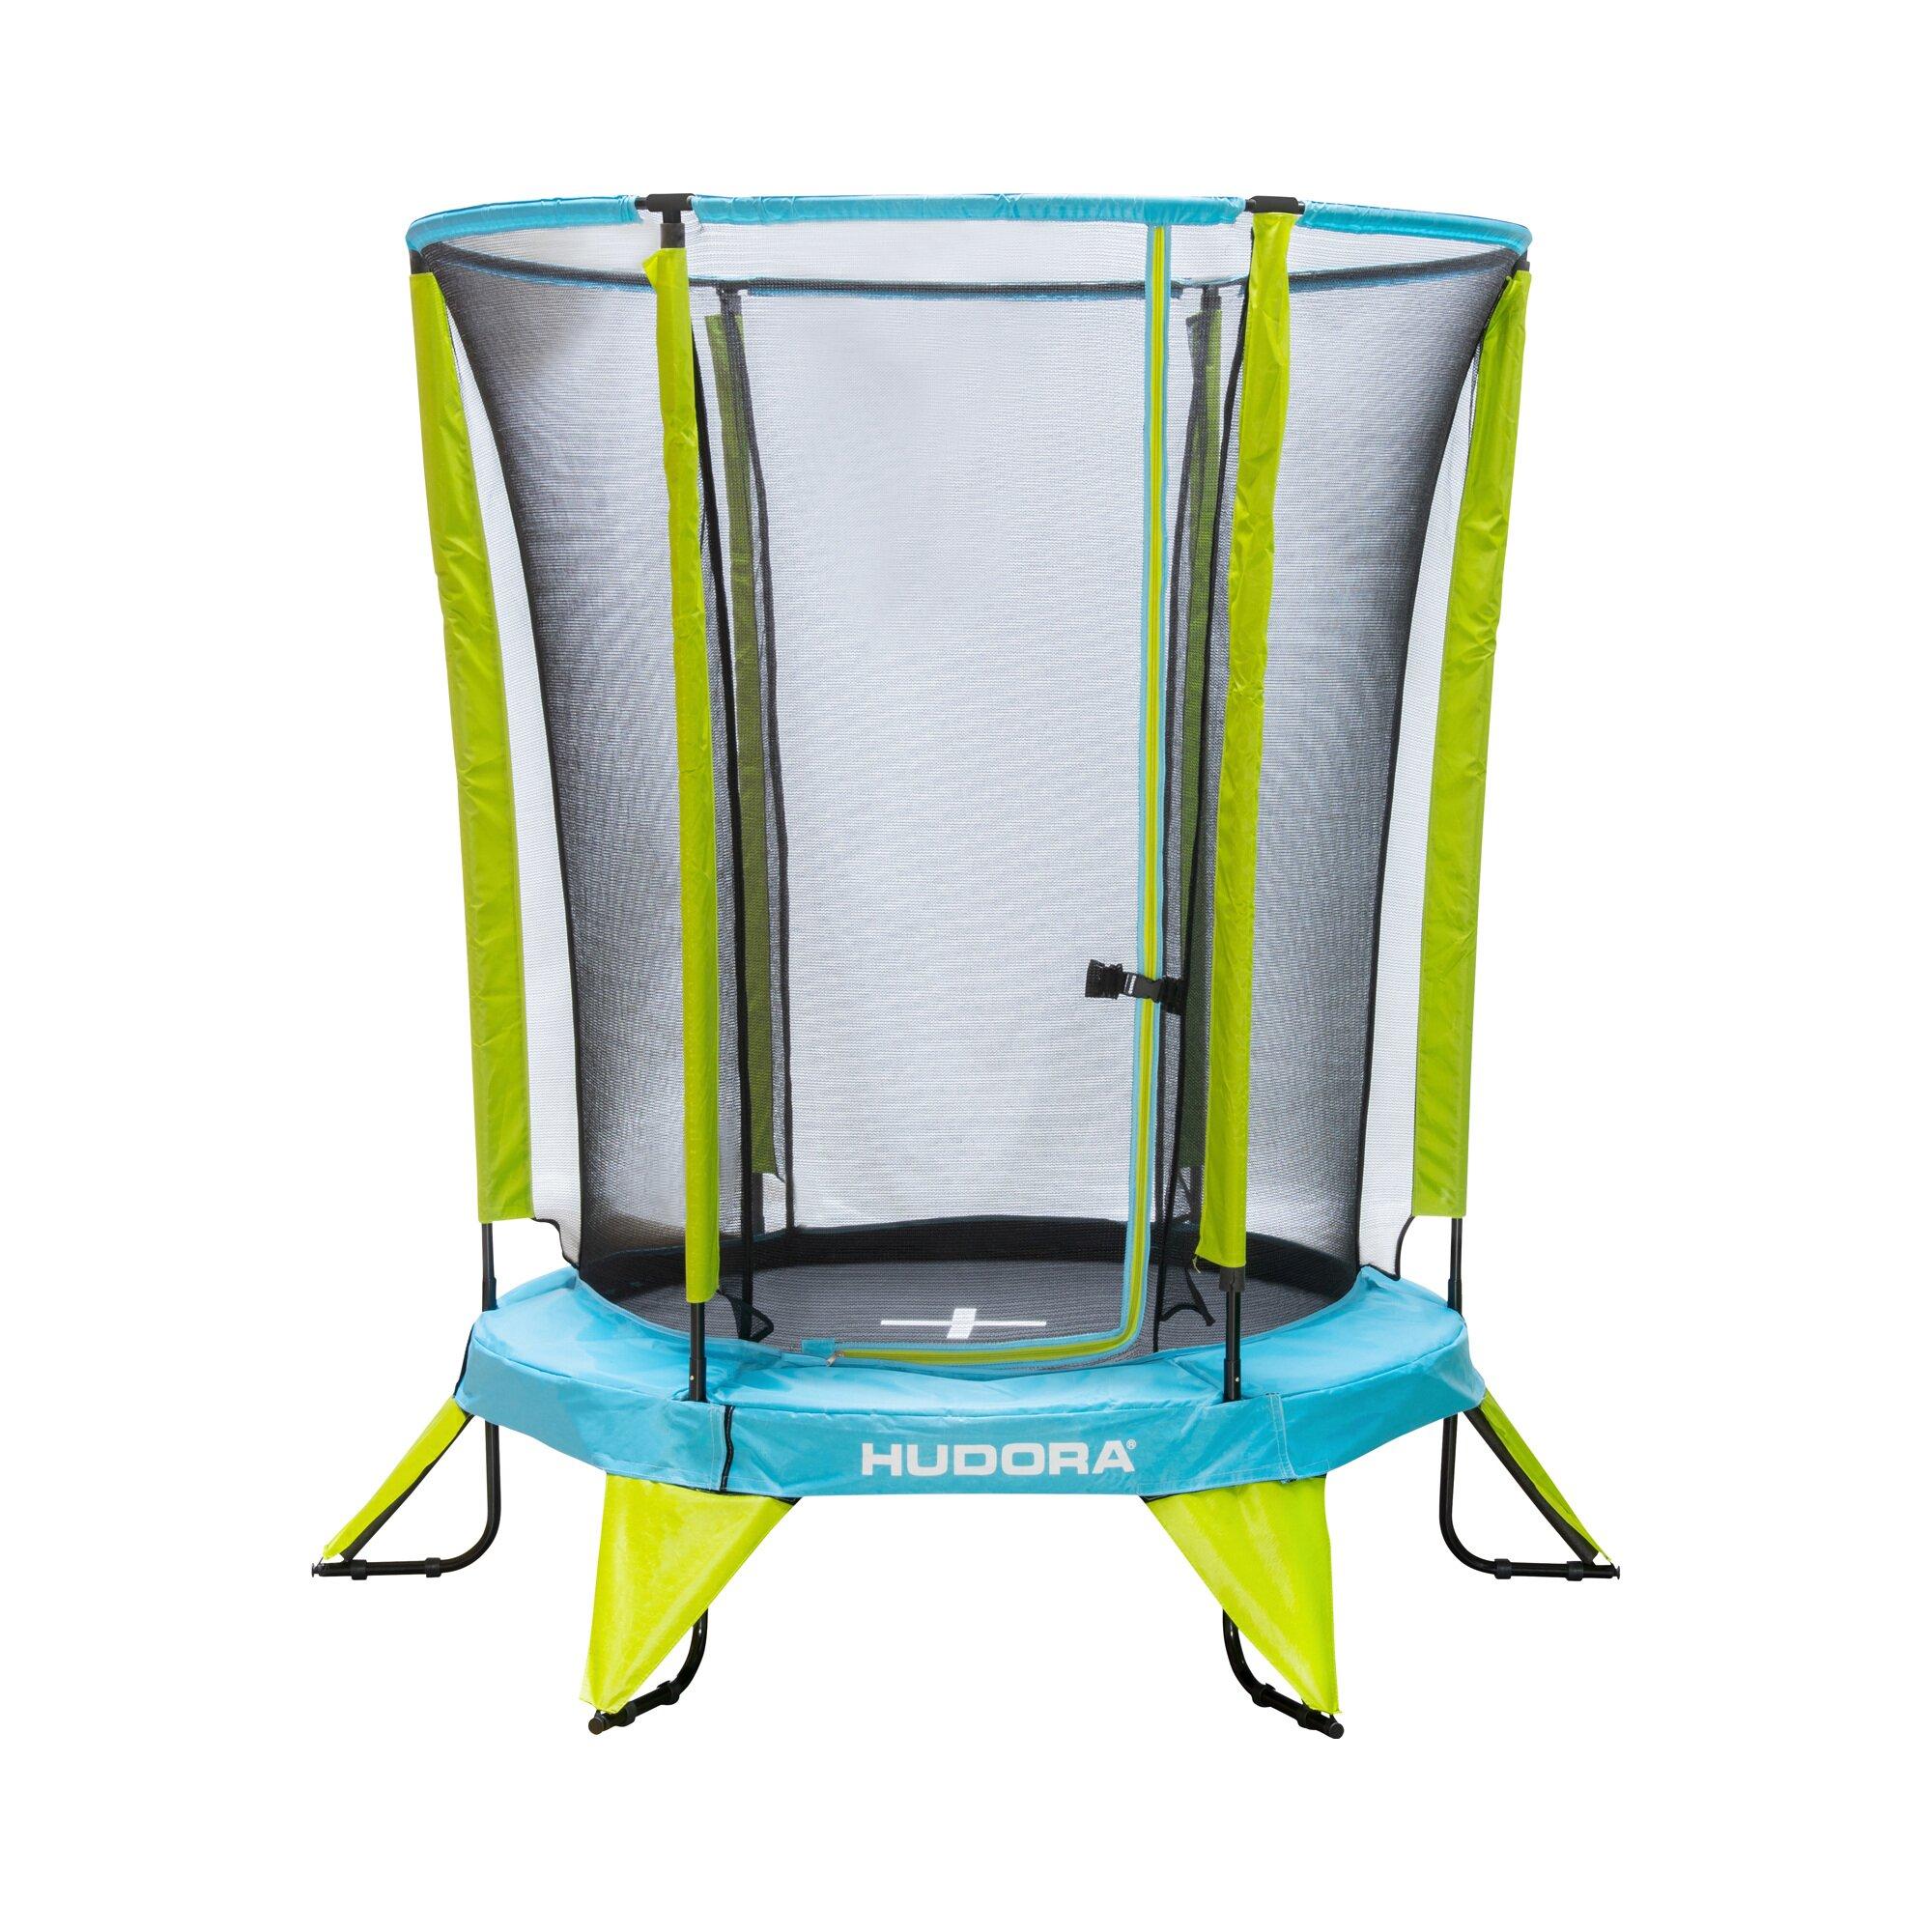 Hudora Kindertrampolin Safety 140